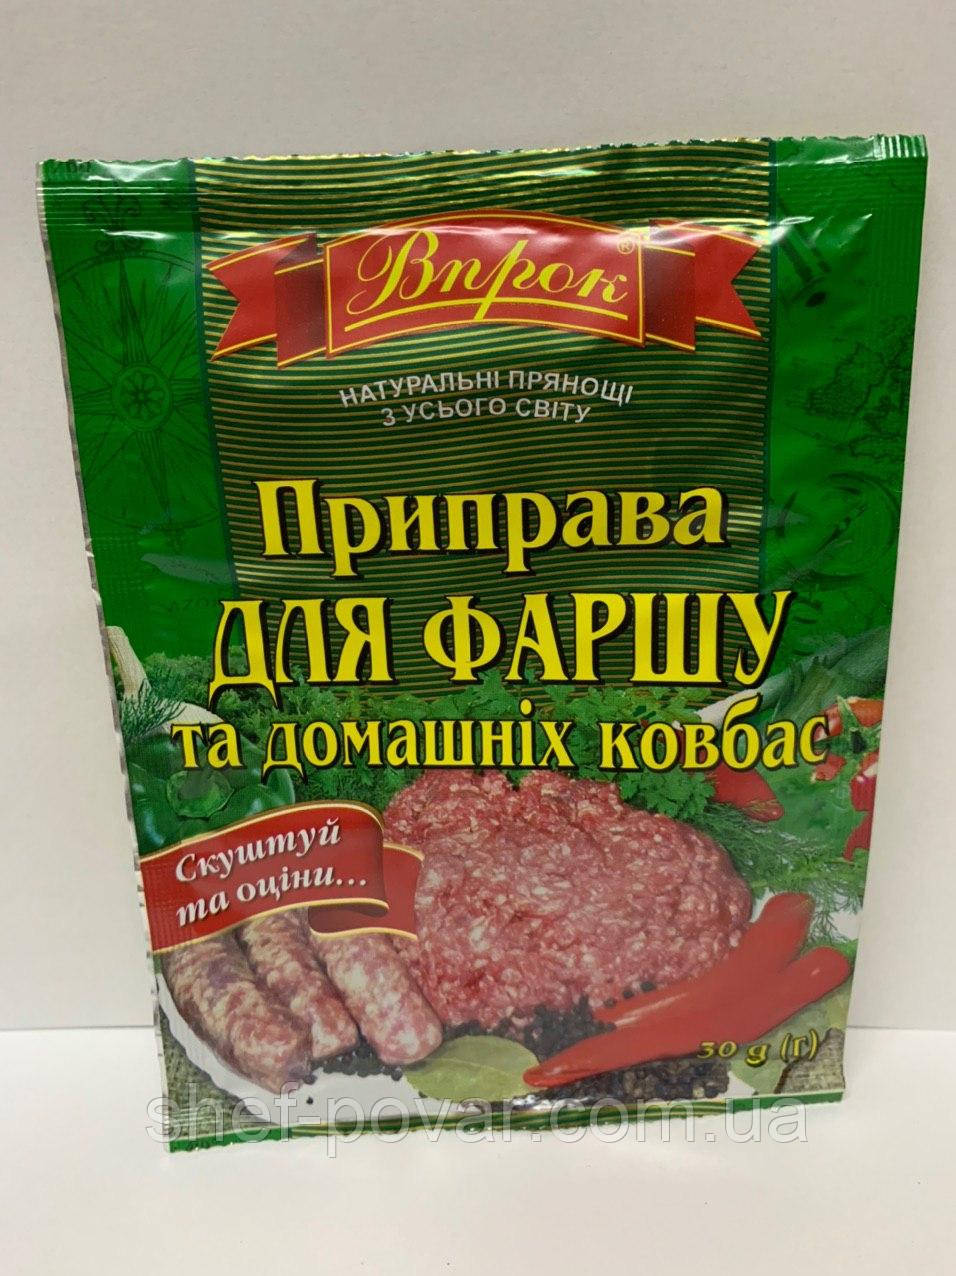 Приправа «Для фарша и домашних колбас» 30 гр. ТМ «Впрок»